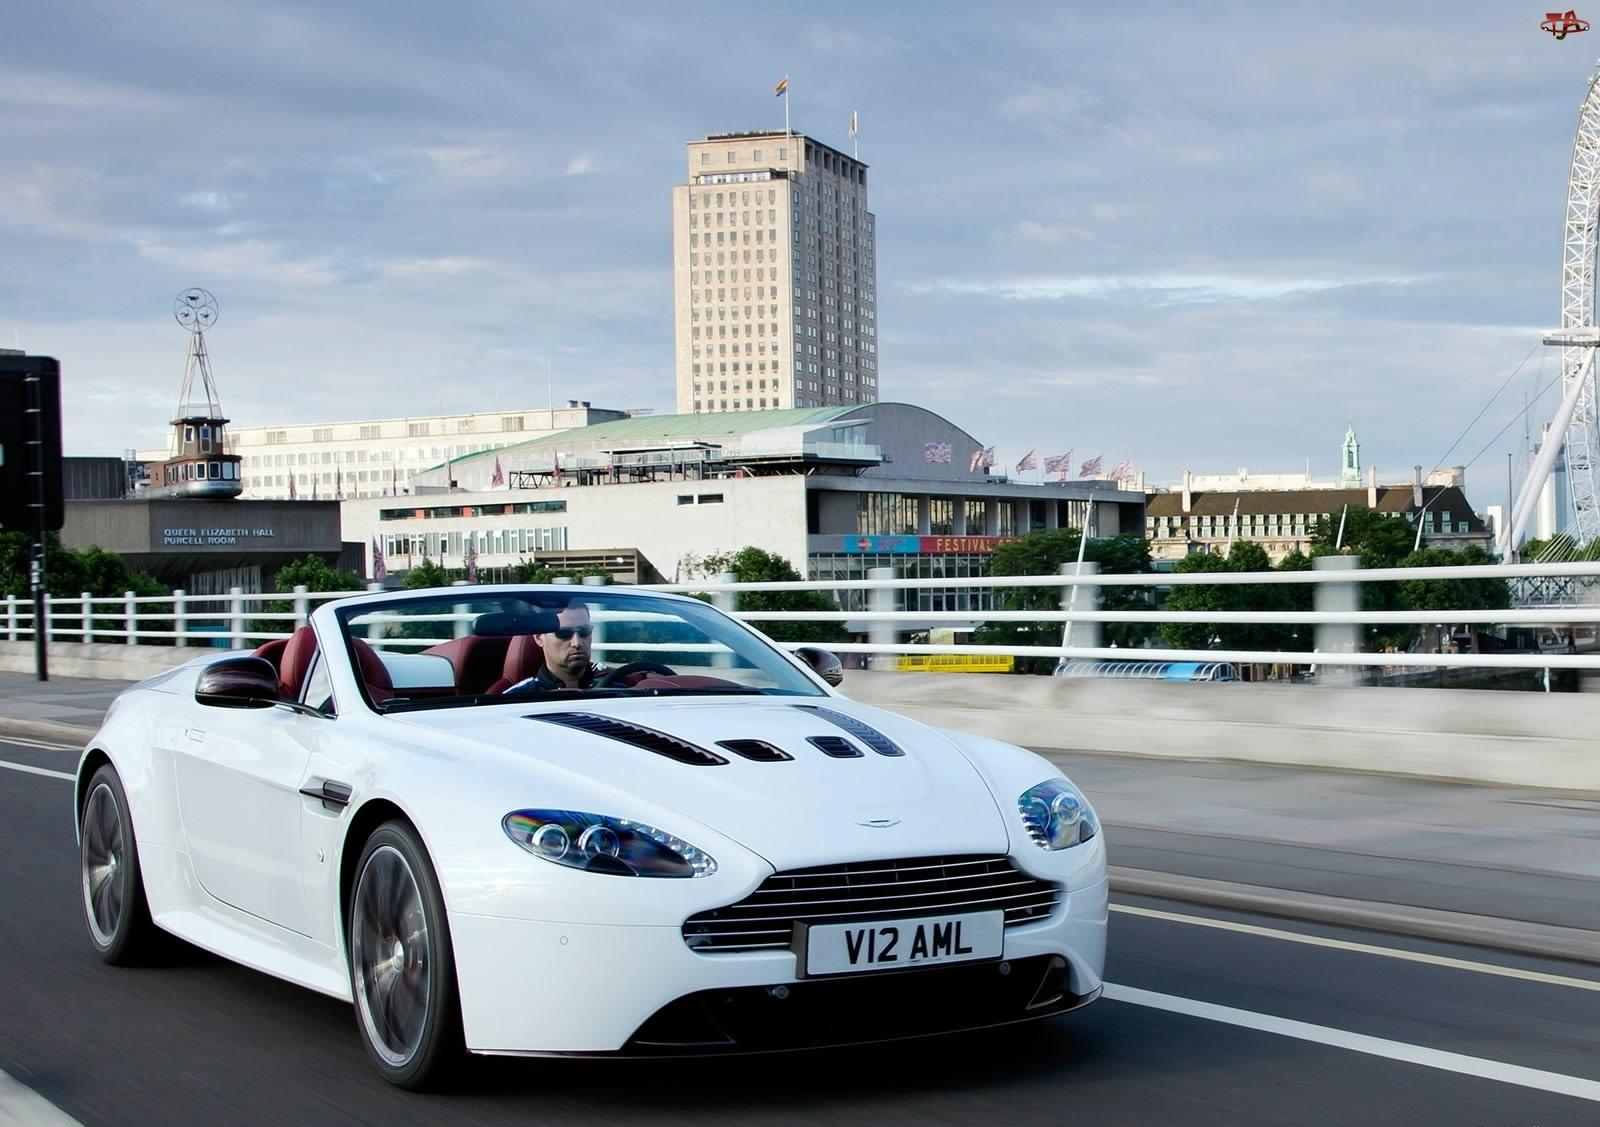 Biały, V12, Aston Martin, Vantage